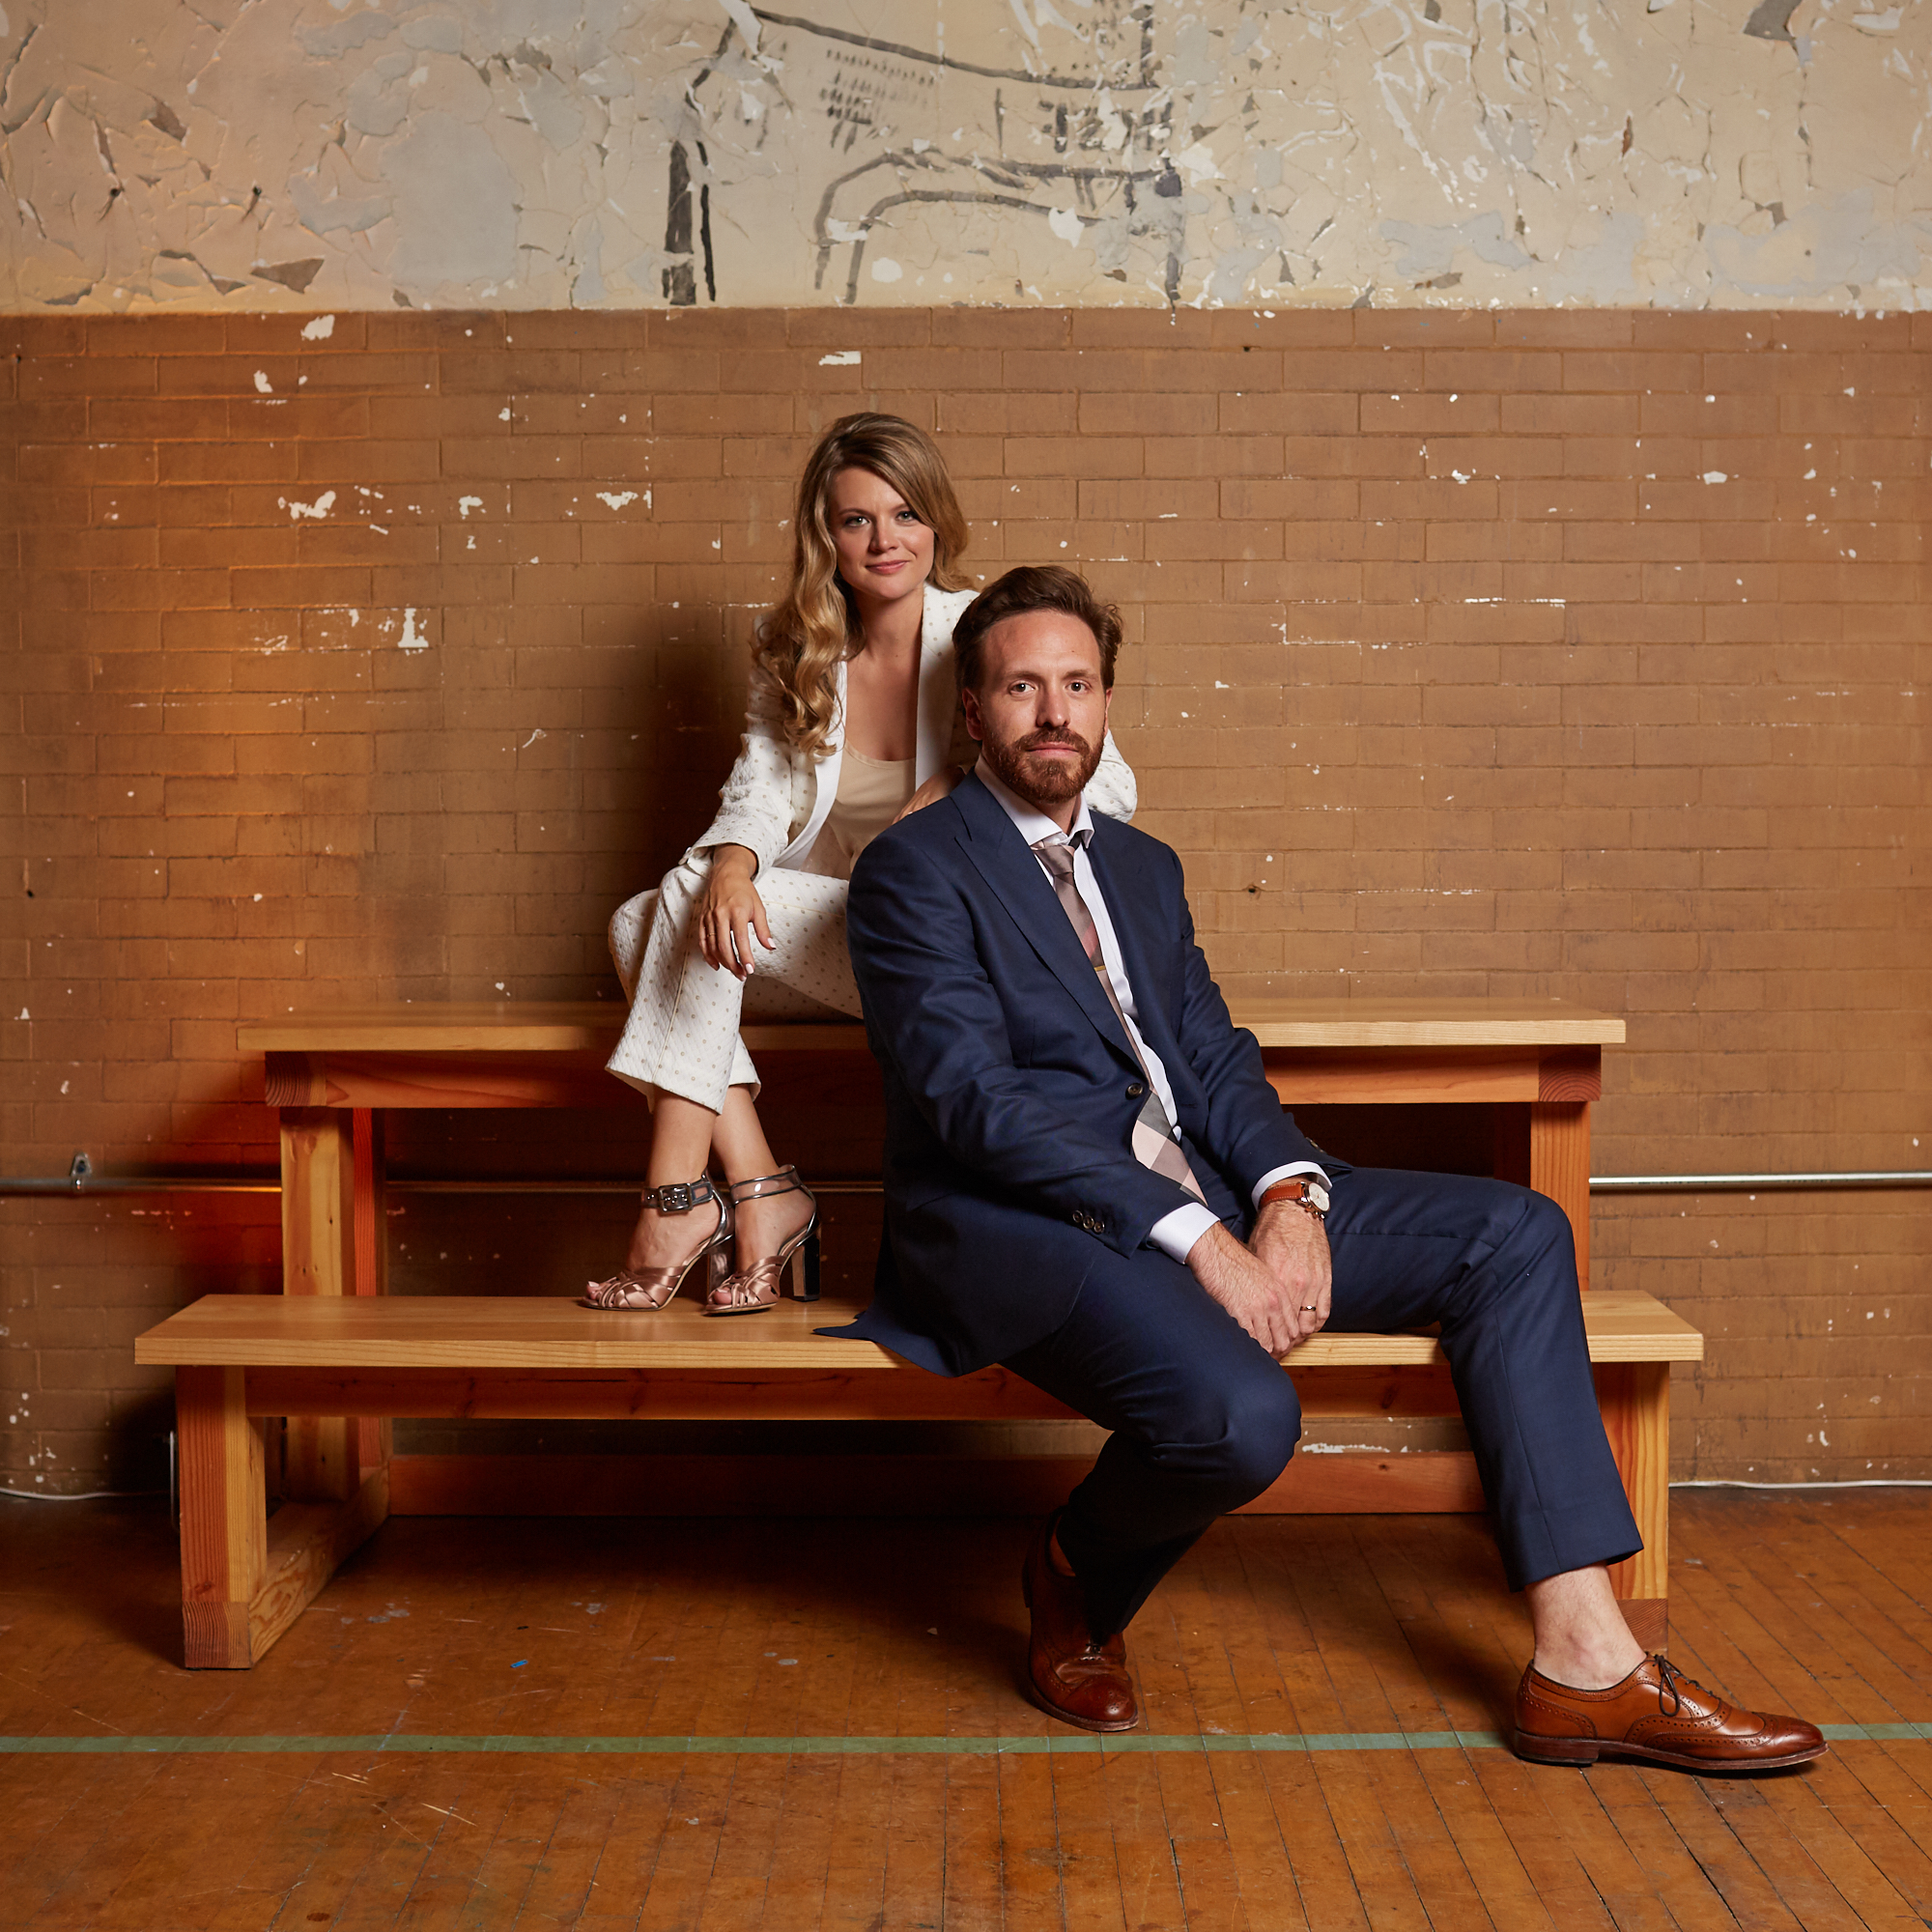 Ryan Hannah Sims - 2017.09 - Wedding Photos - 1003.jpg